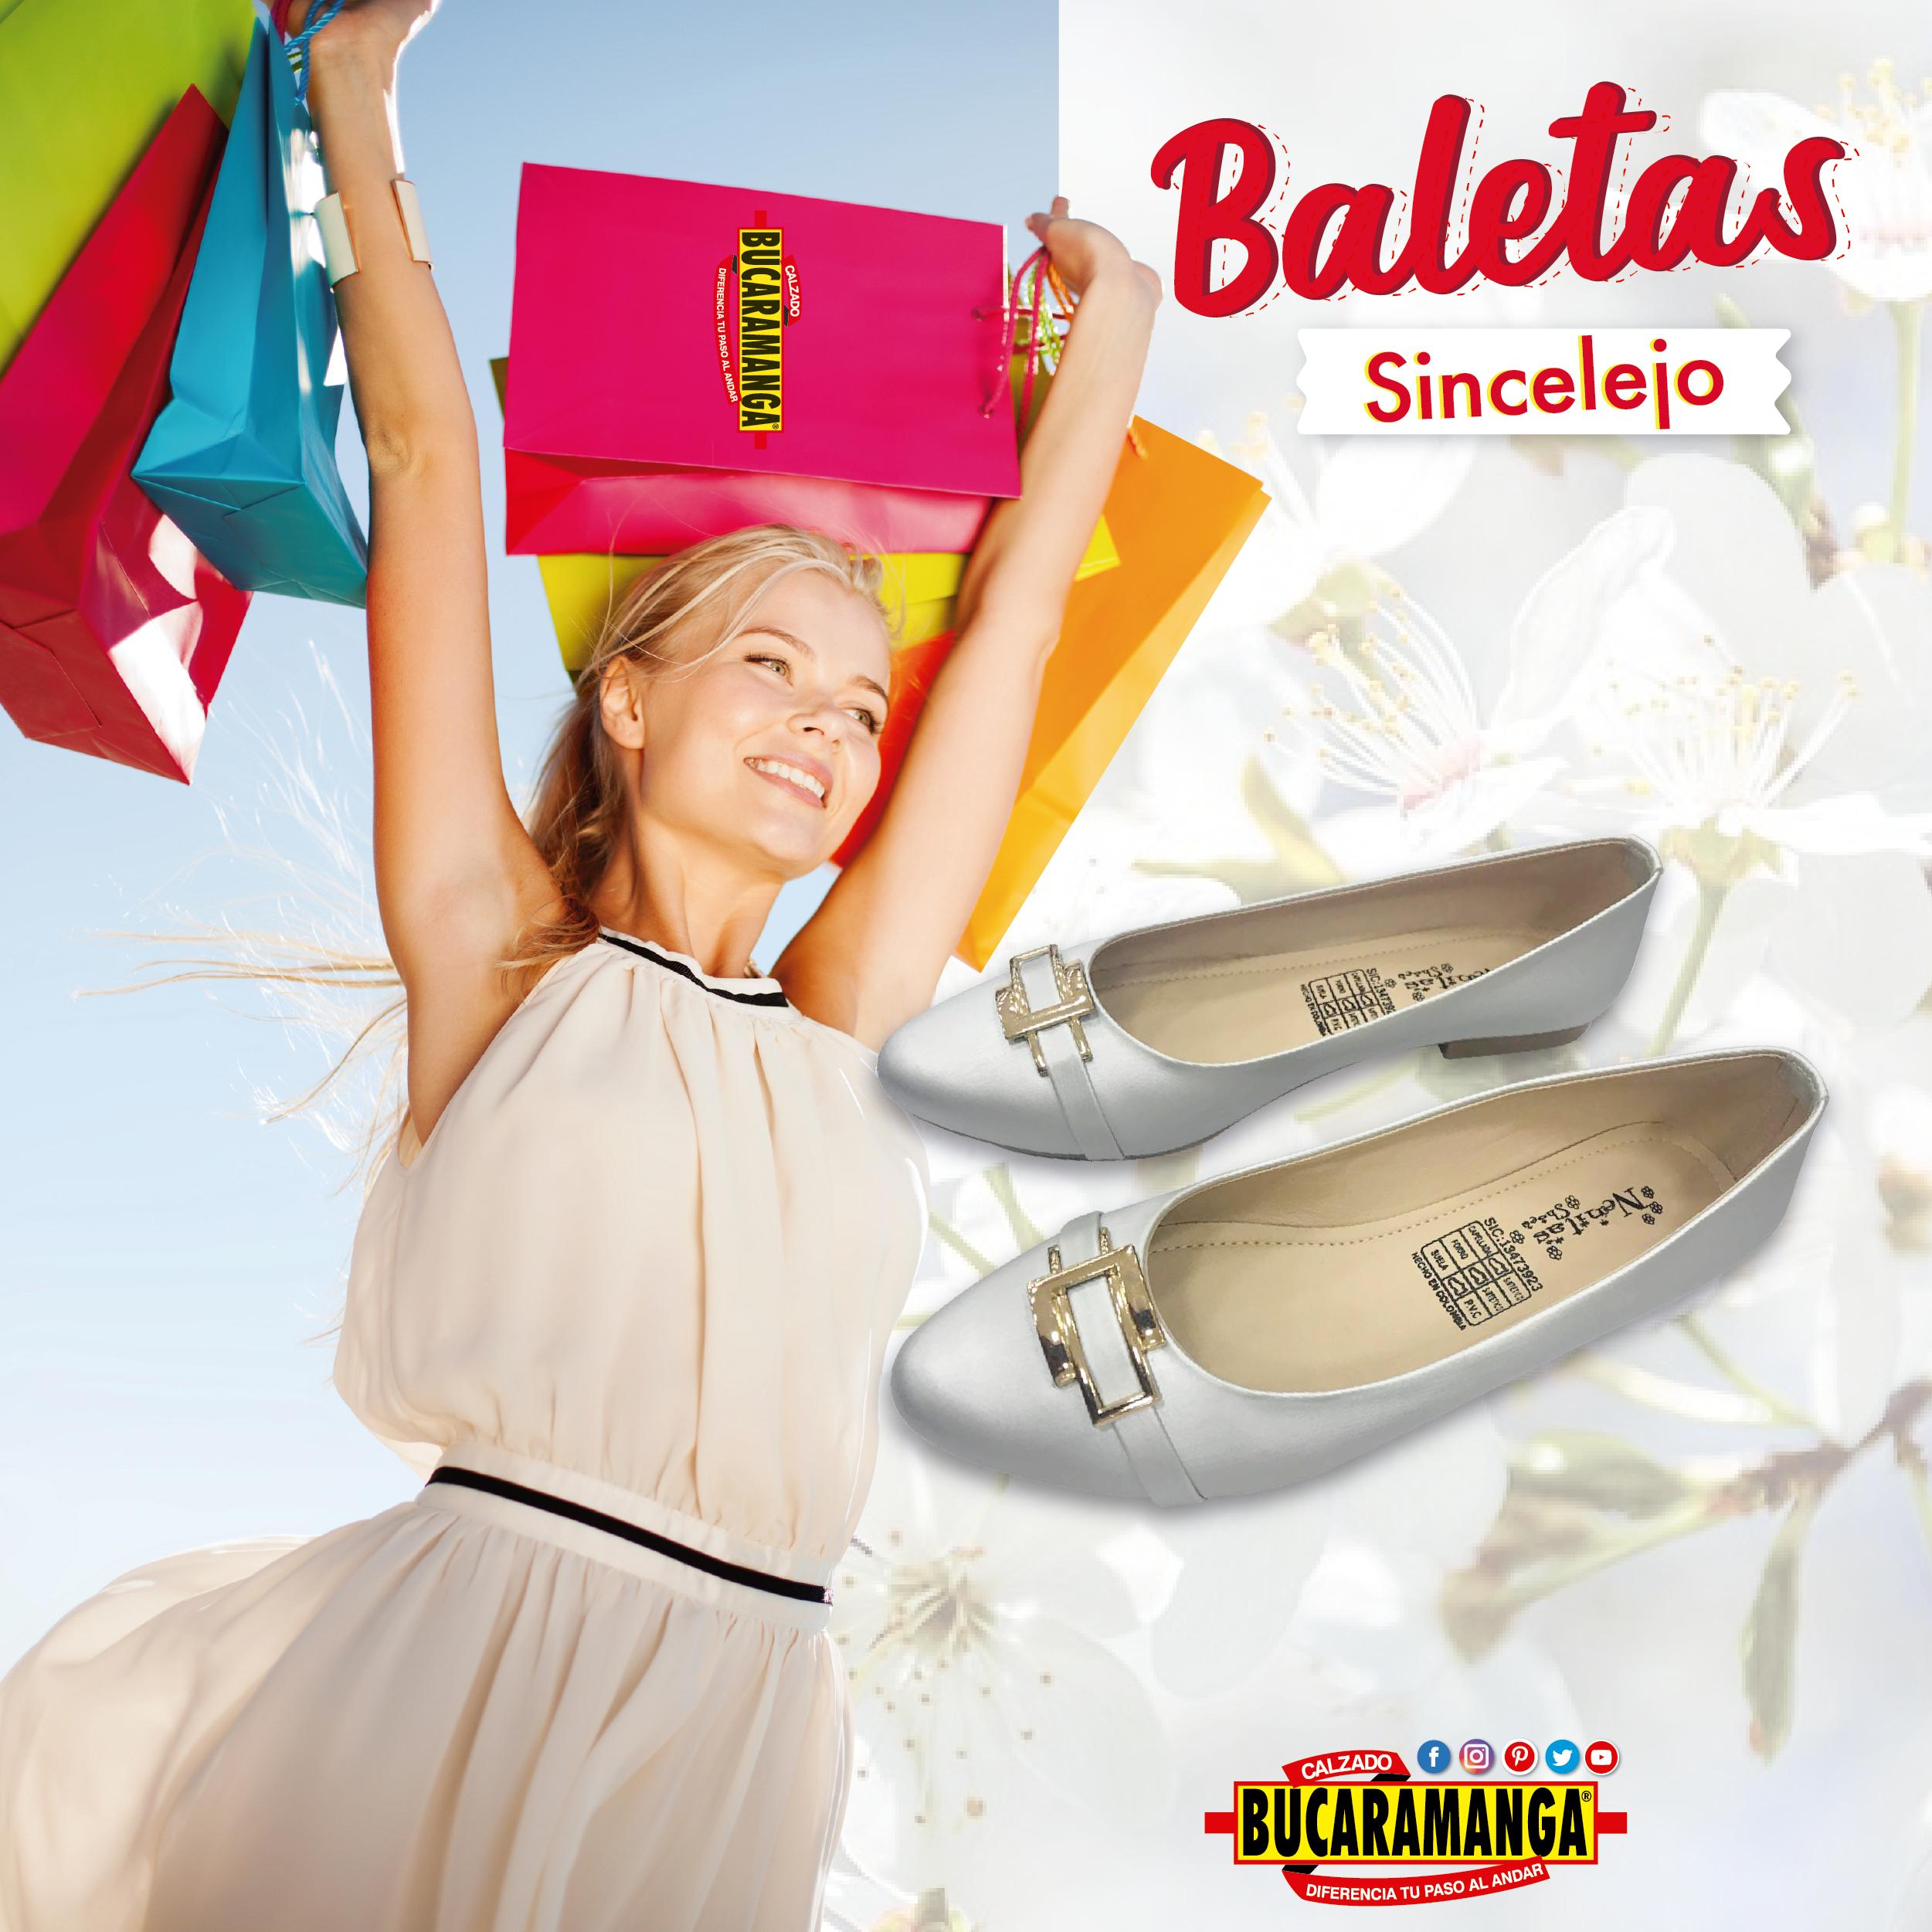 c19ac29450 ¡Destácate! con la #NuevaColección de Calzado Bucaramanga #Sincelejo. www. calzadobucaramanga